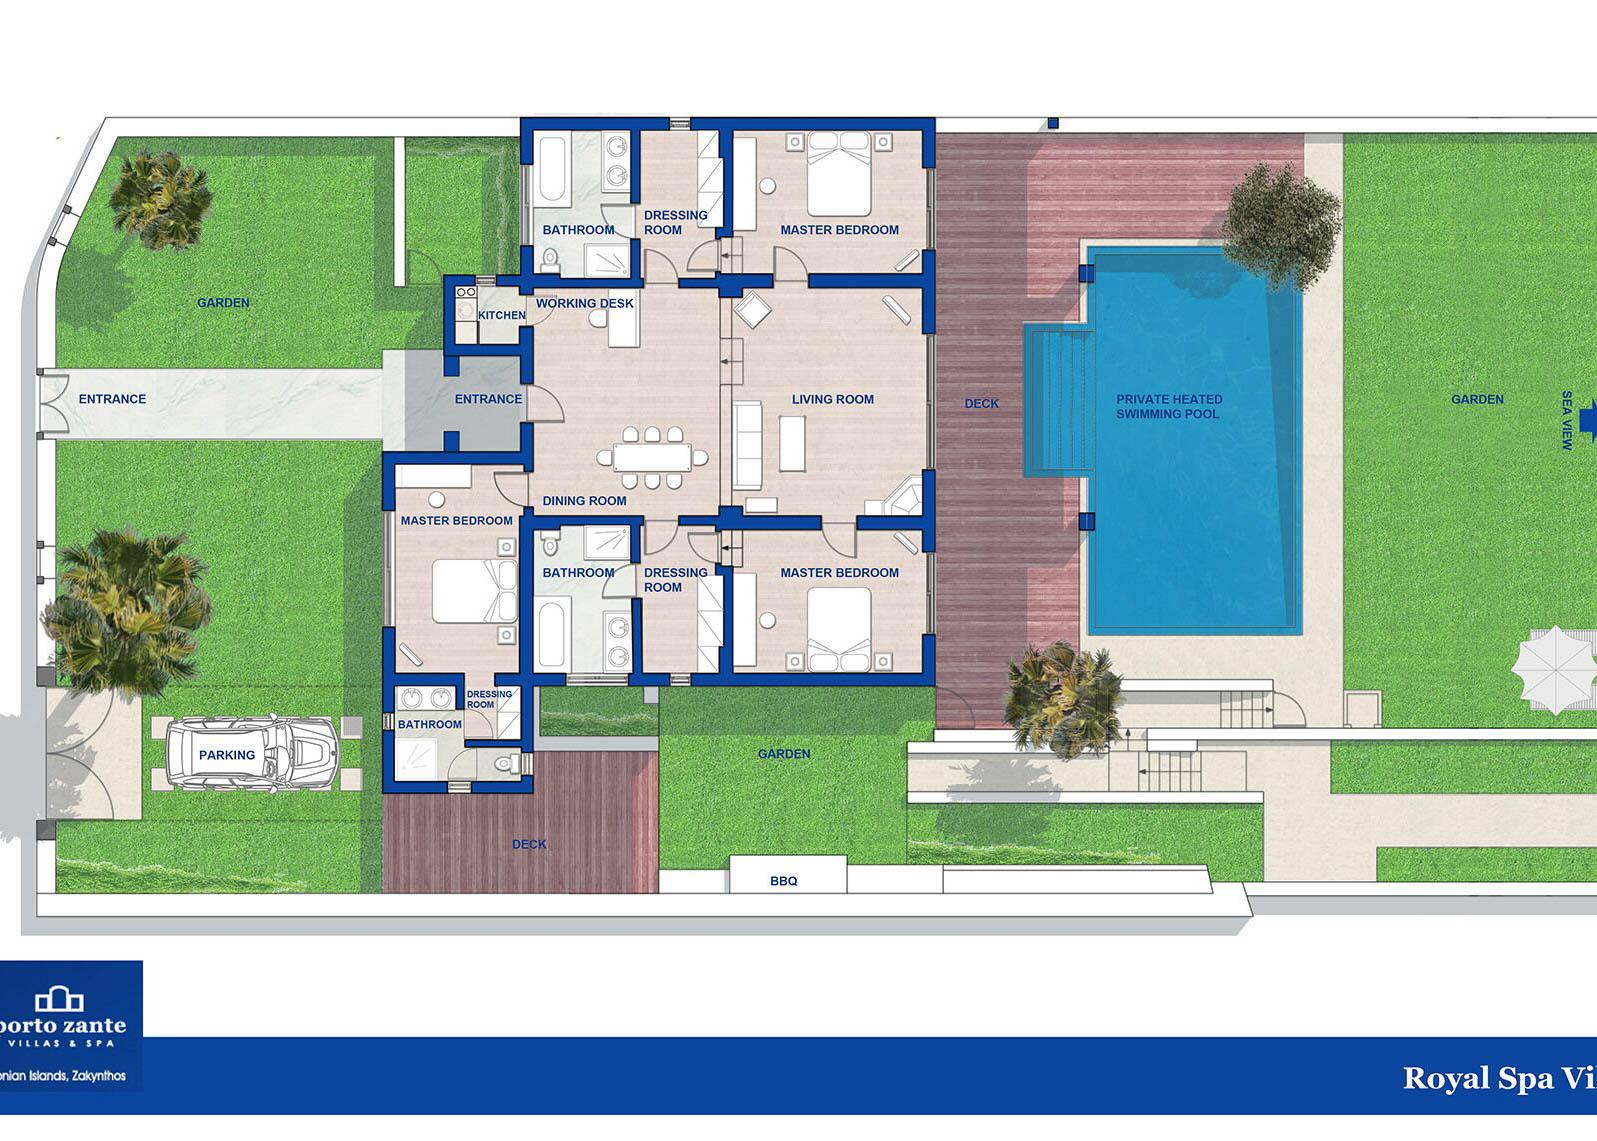 Royal spa villa floorplan